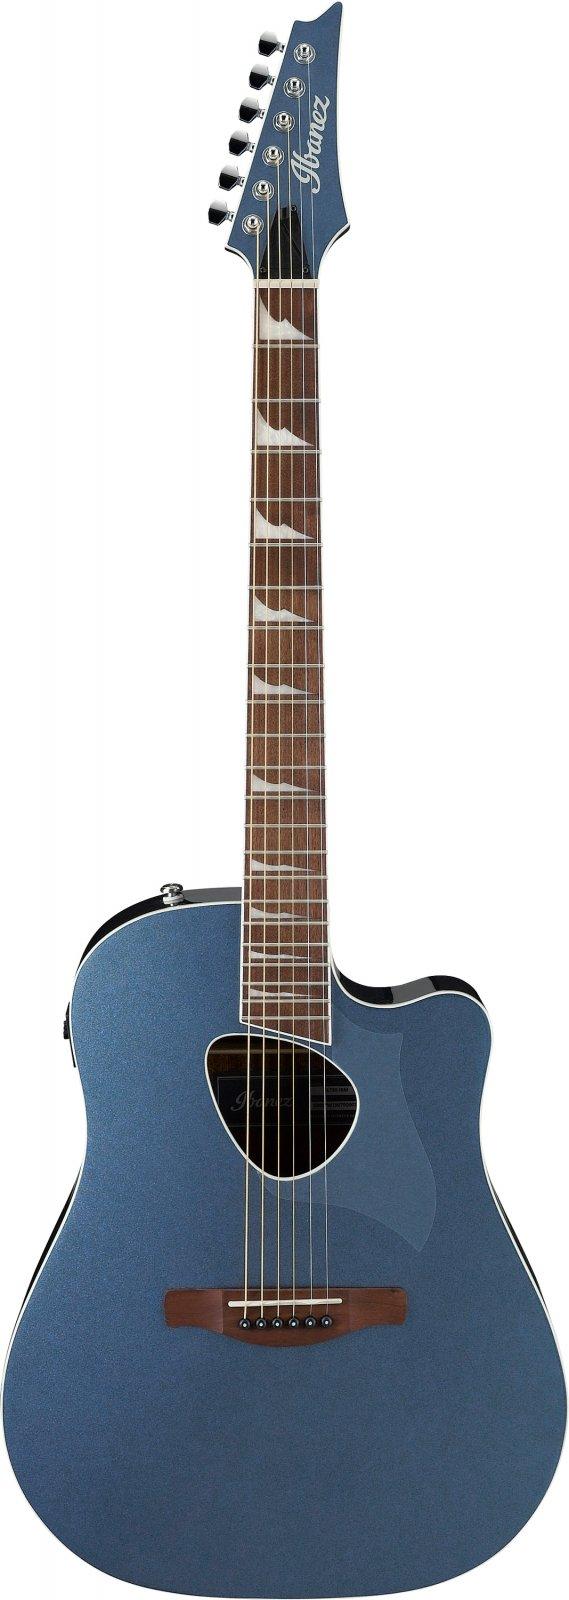 Ibanez ALT30IBM - 6 string ALTSTAR guitar - Indigo Blue Metallic High Gloss